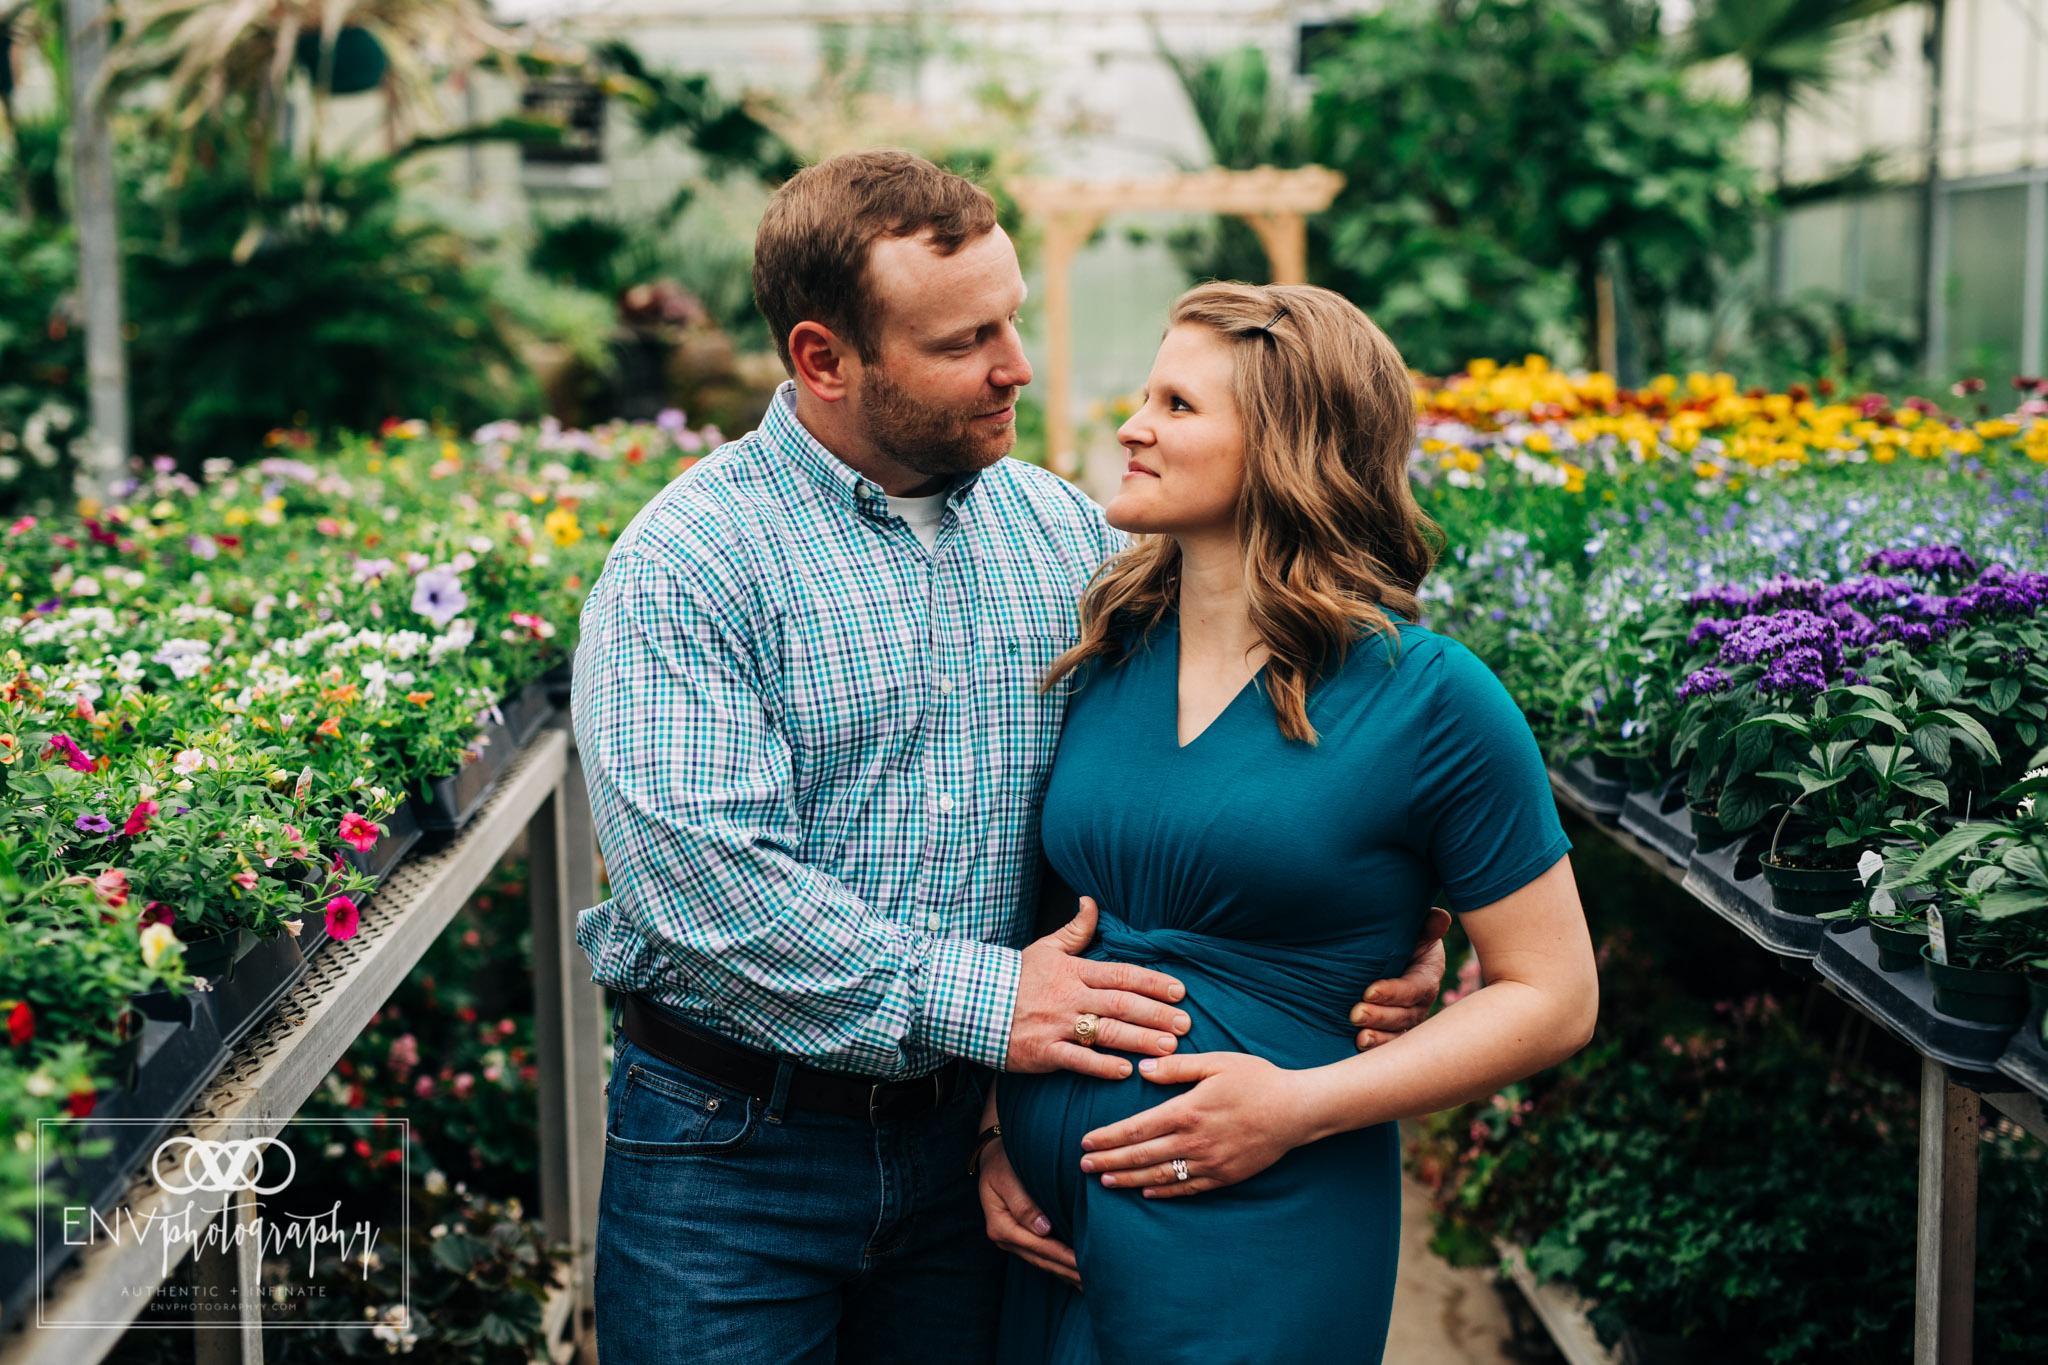 mount vernon columbus mansfield ohio maternity newborn photographer mohican gardens (5).jpg